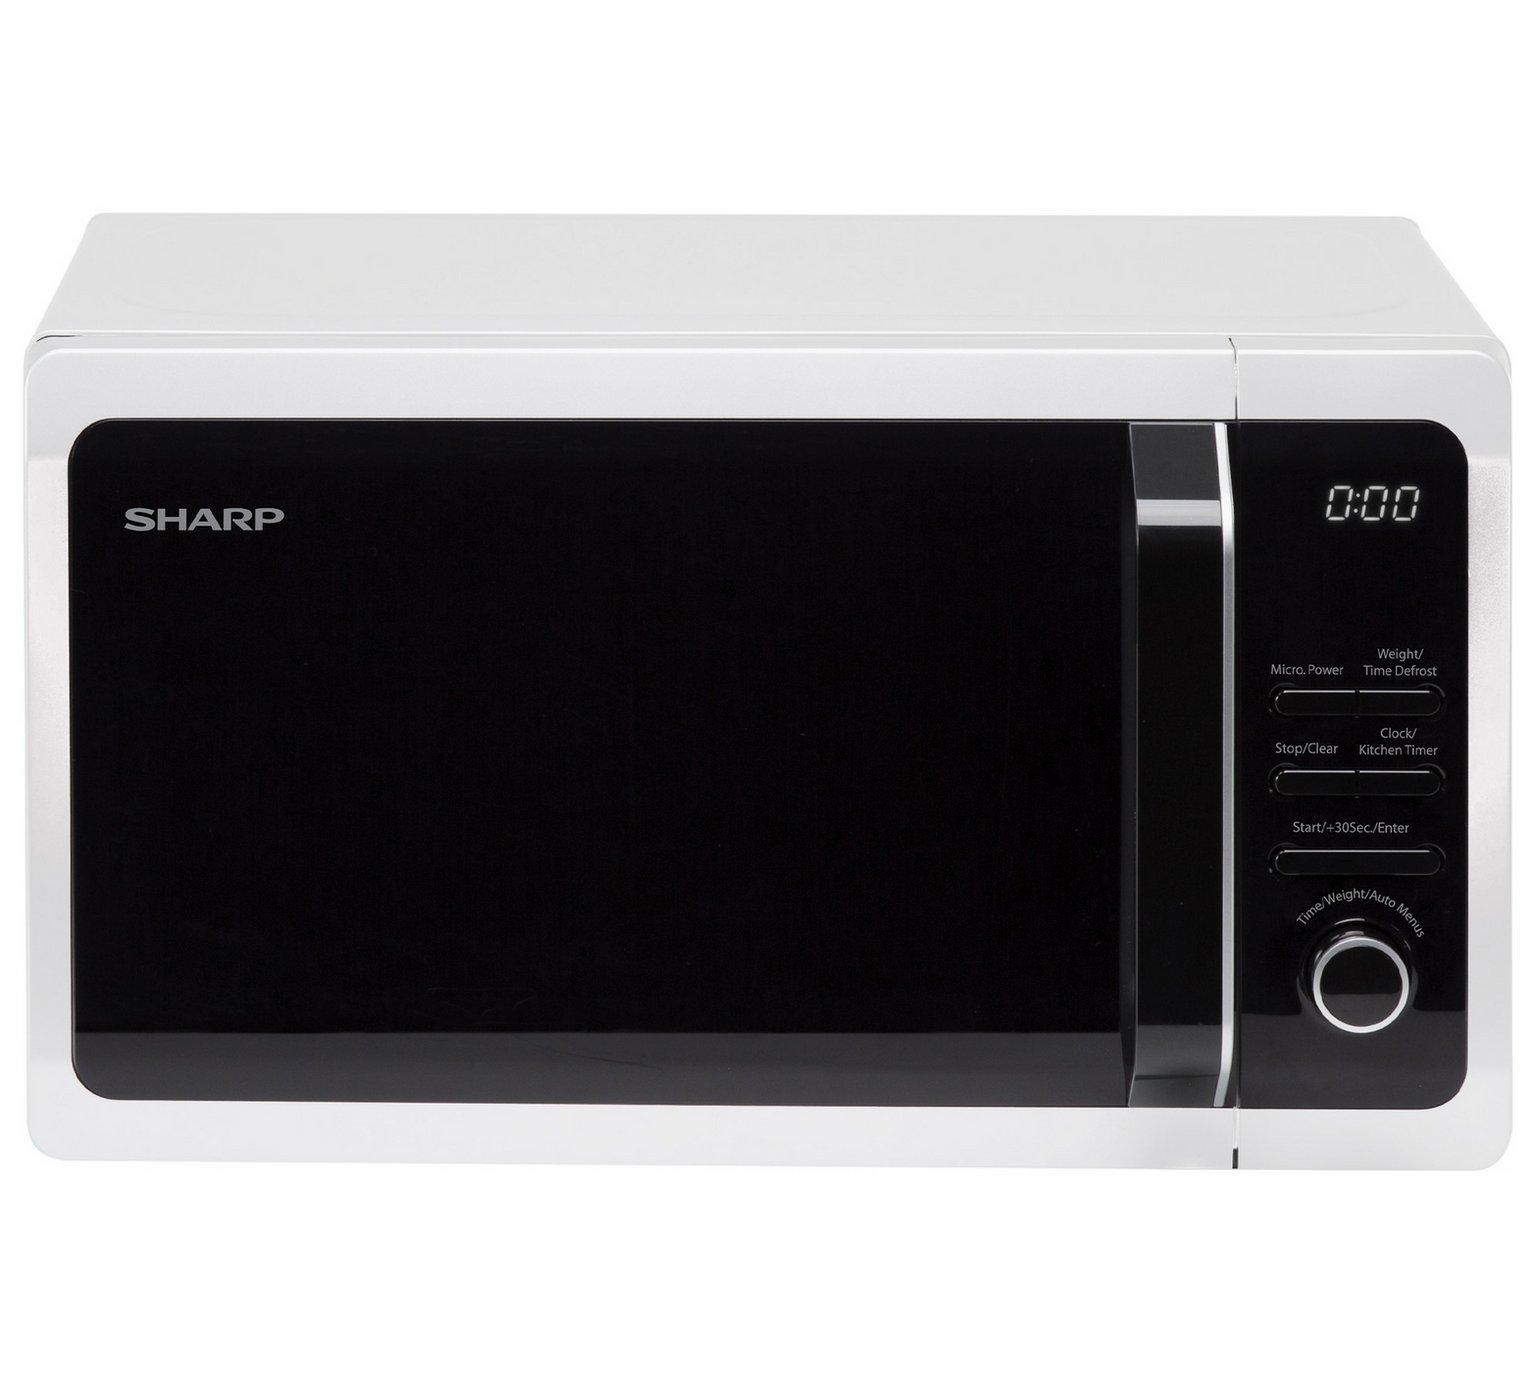 sharp r274wm 20 litre 800 watt microwave in white